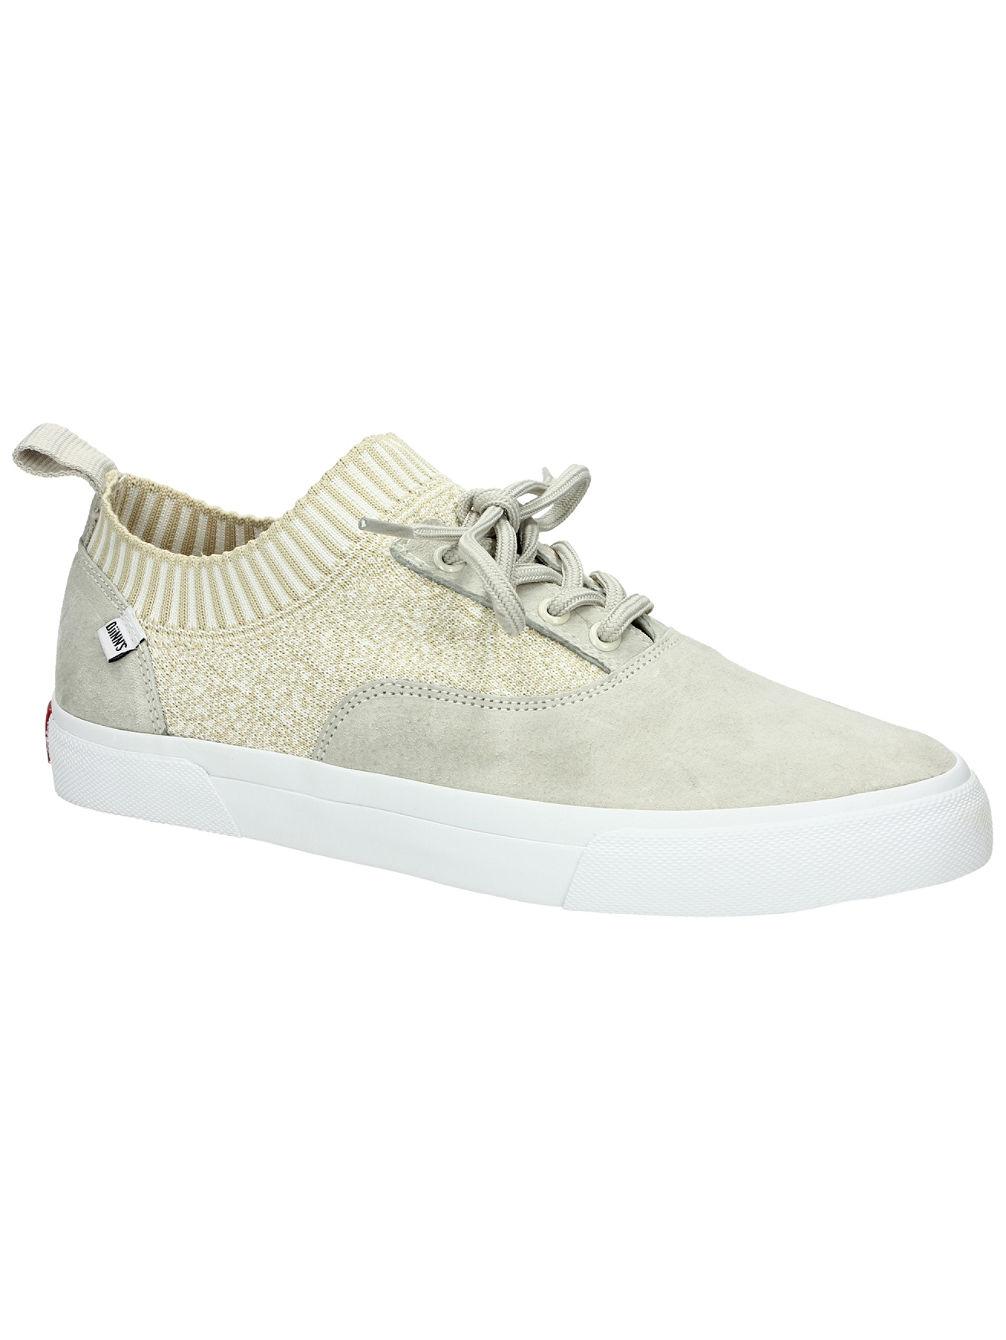 djinns-sub-age-soc-youname-knit-sneakers